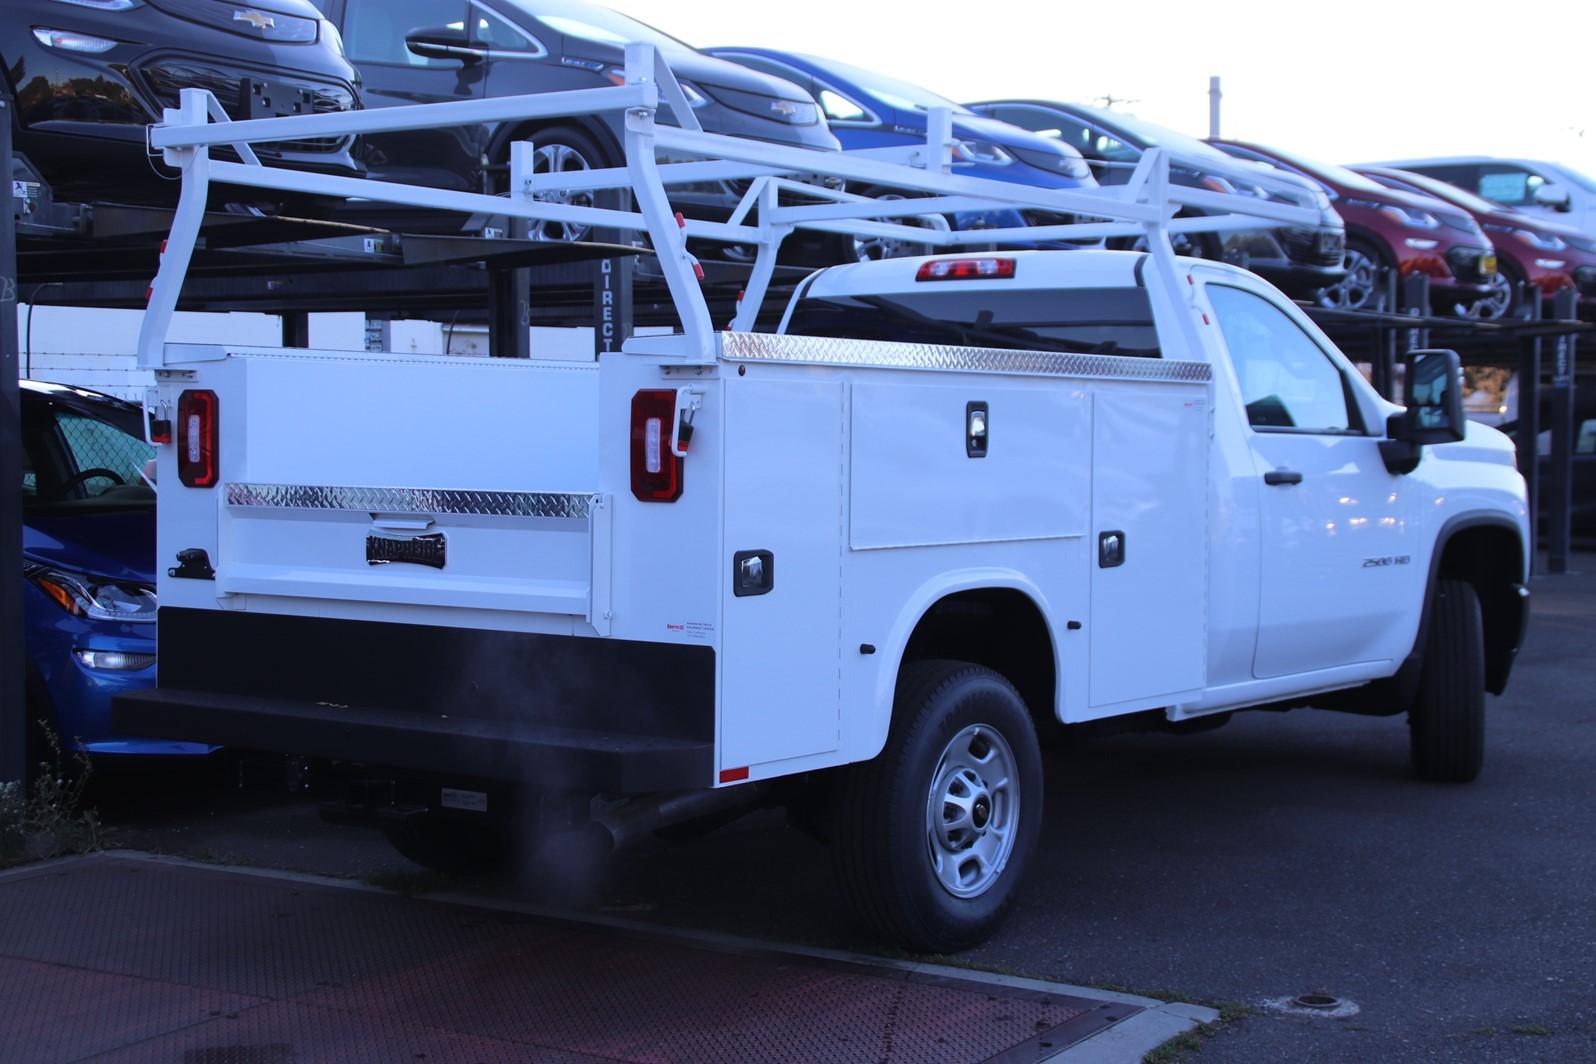 2020 Chevrolet Silverado 2500 Regular Cab 4x2, Knapheide Steel Service Body #C02308 - photo 2